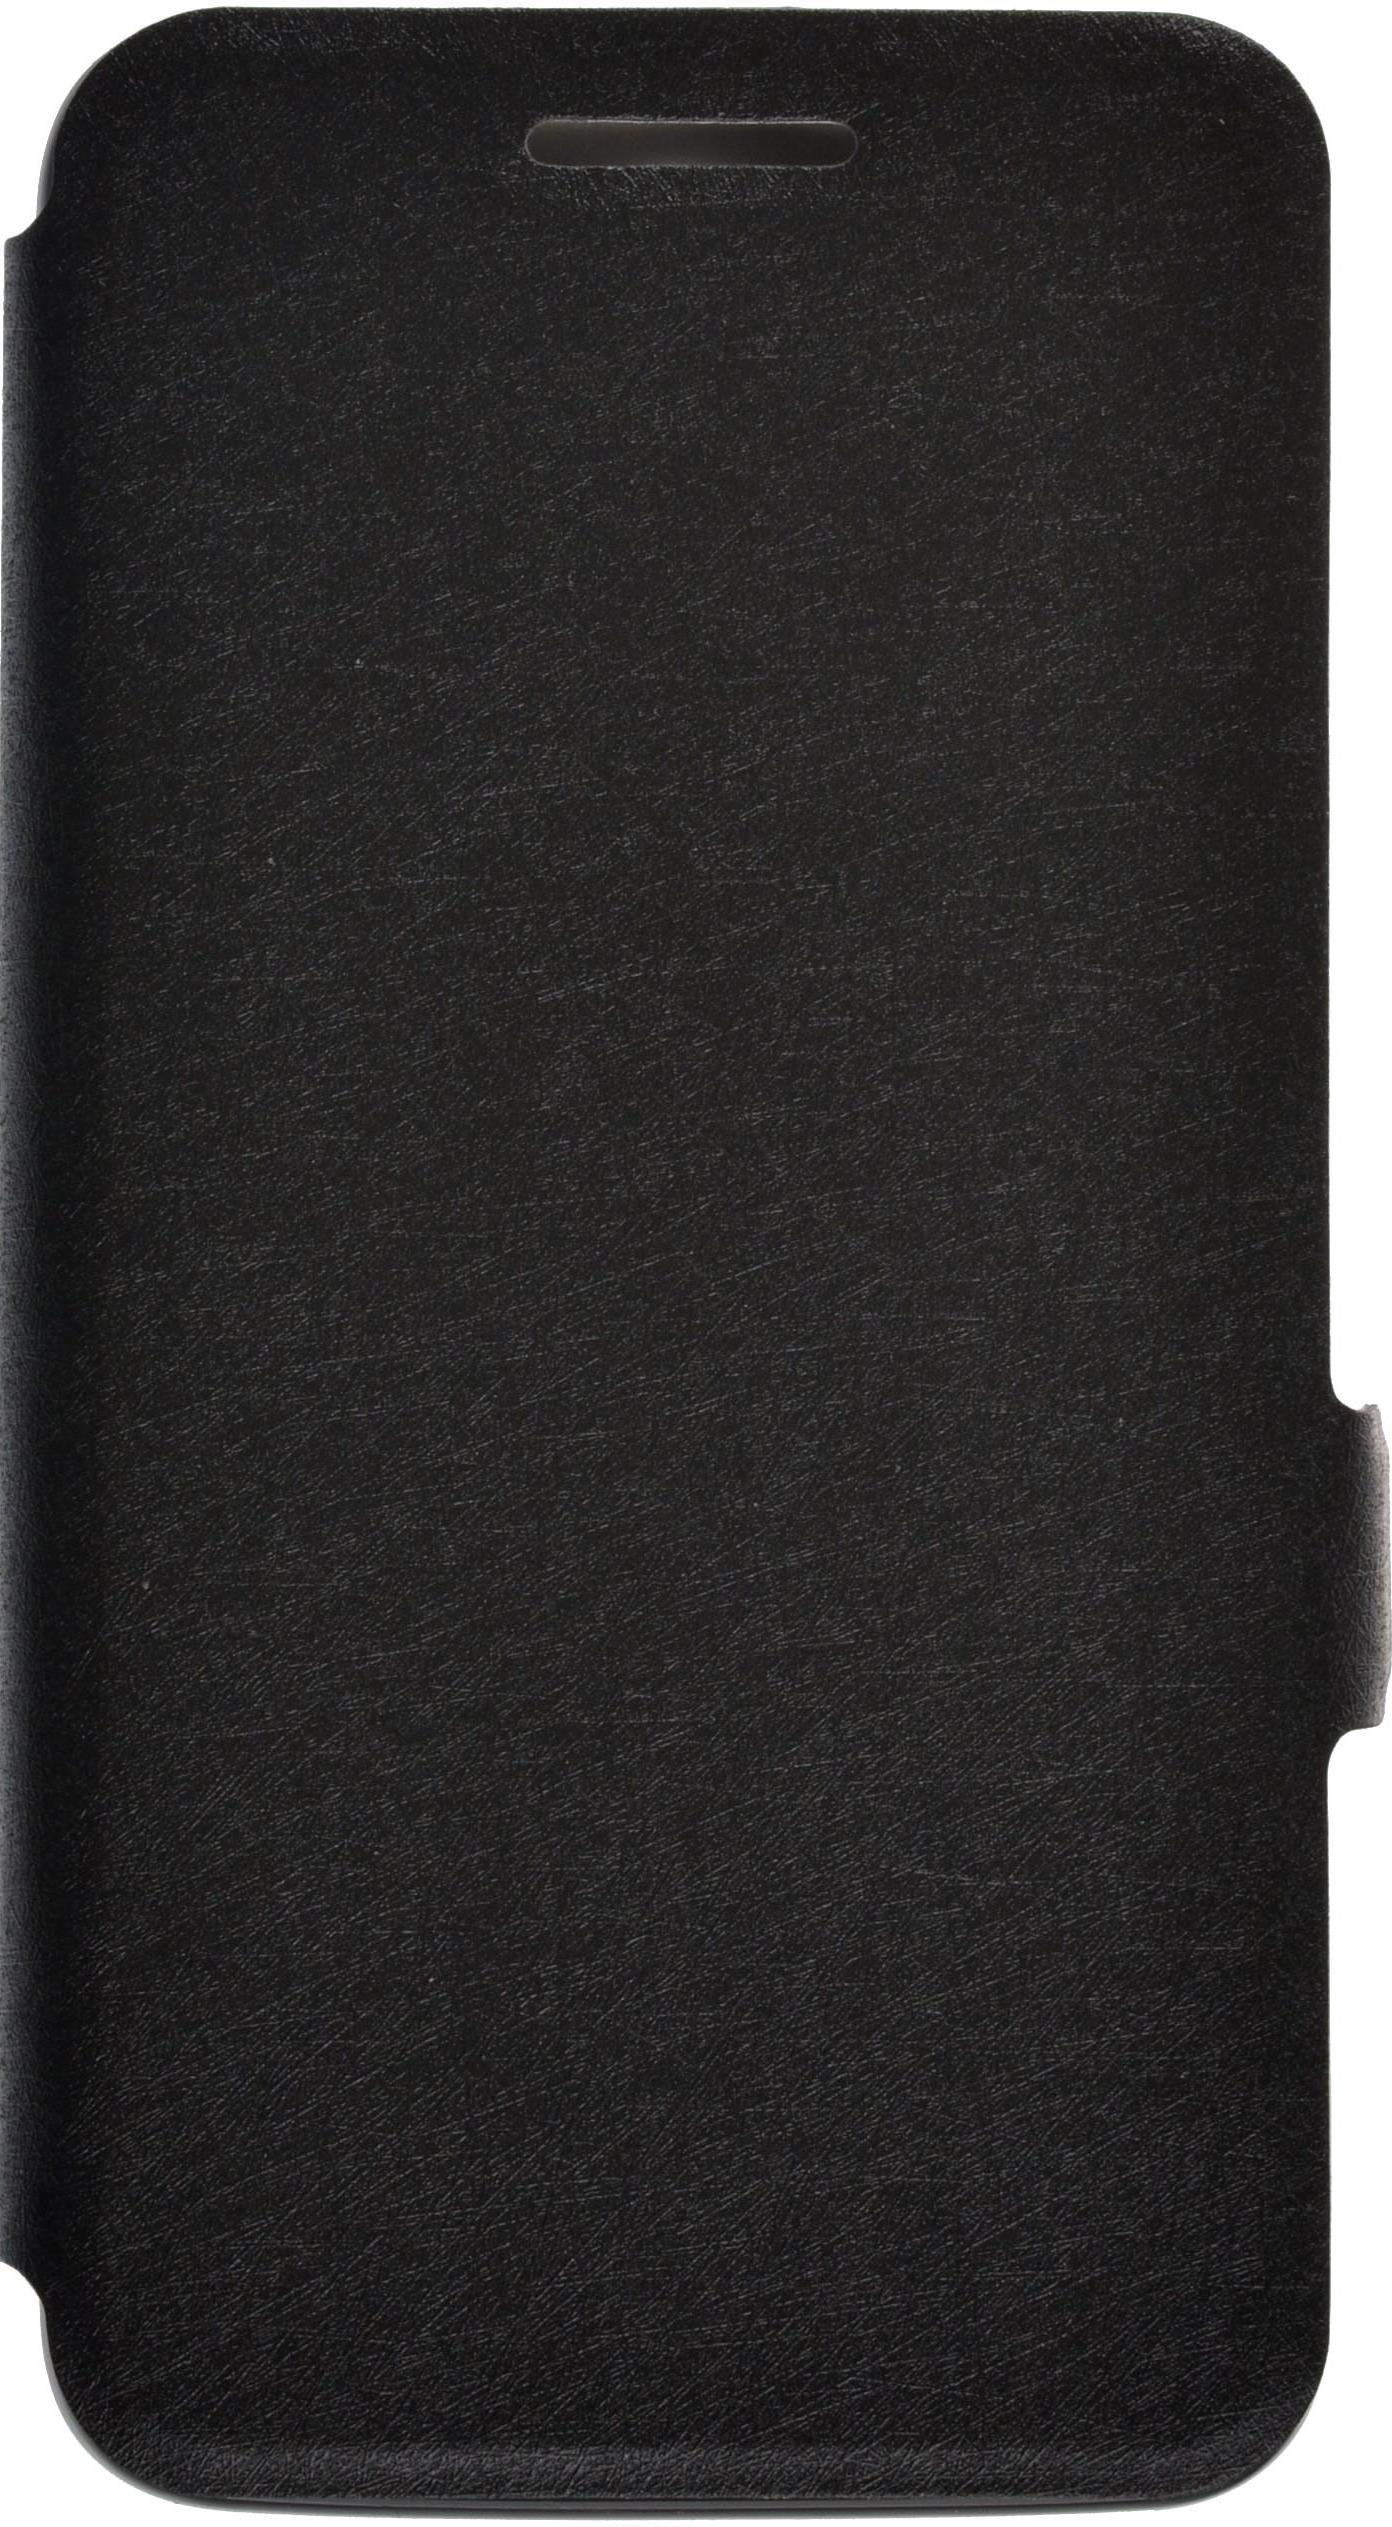 Чехол Prime Book для Lenovo A3600/3800, 2000000083506, черный